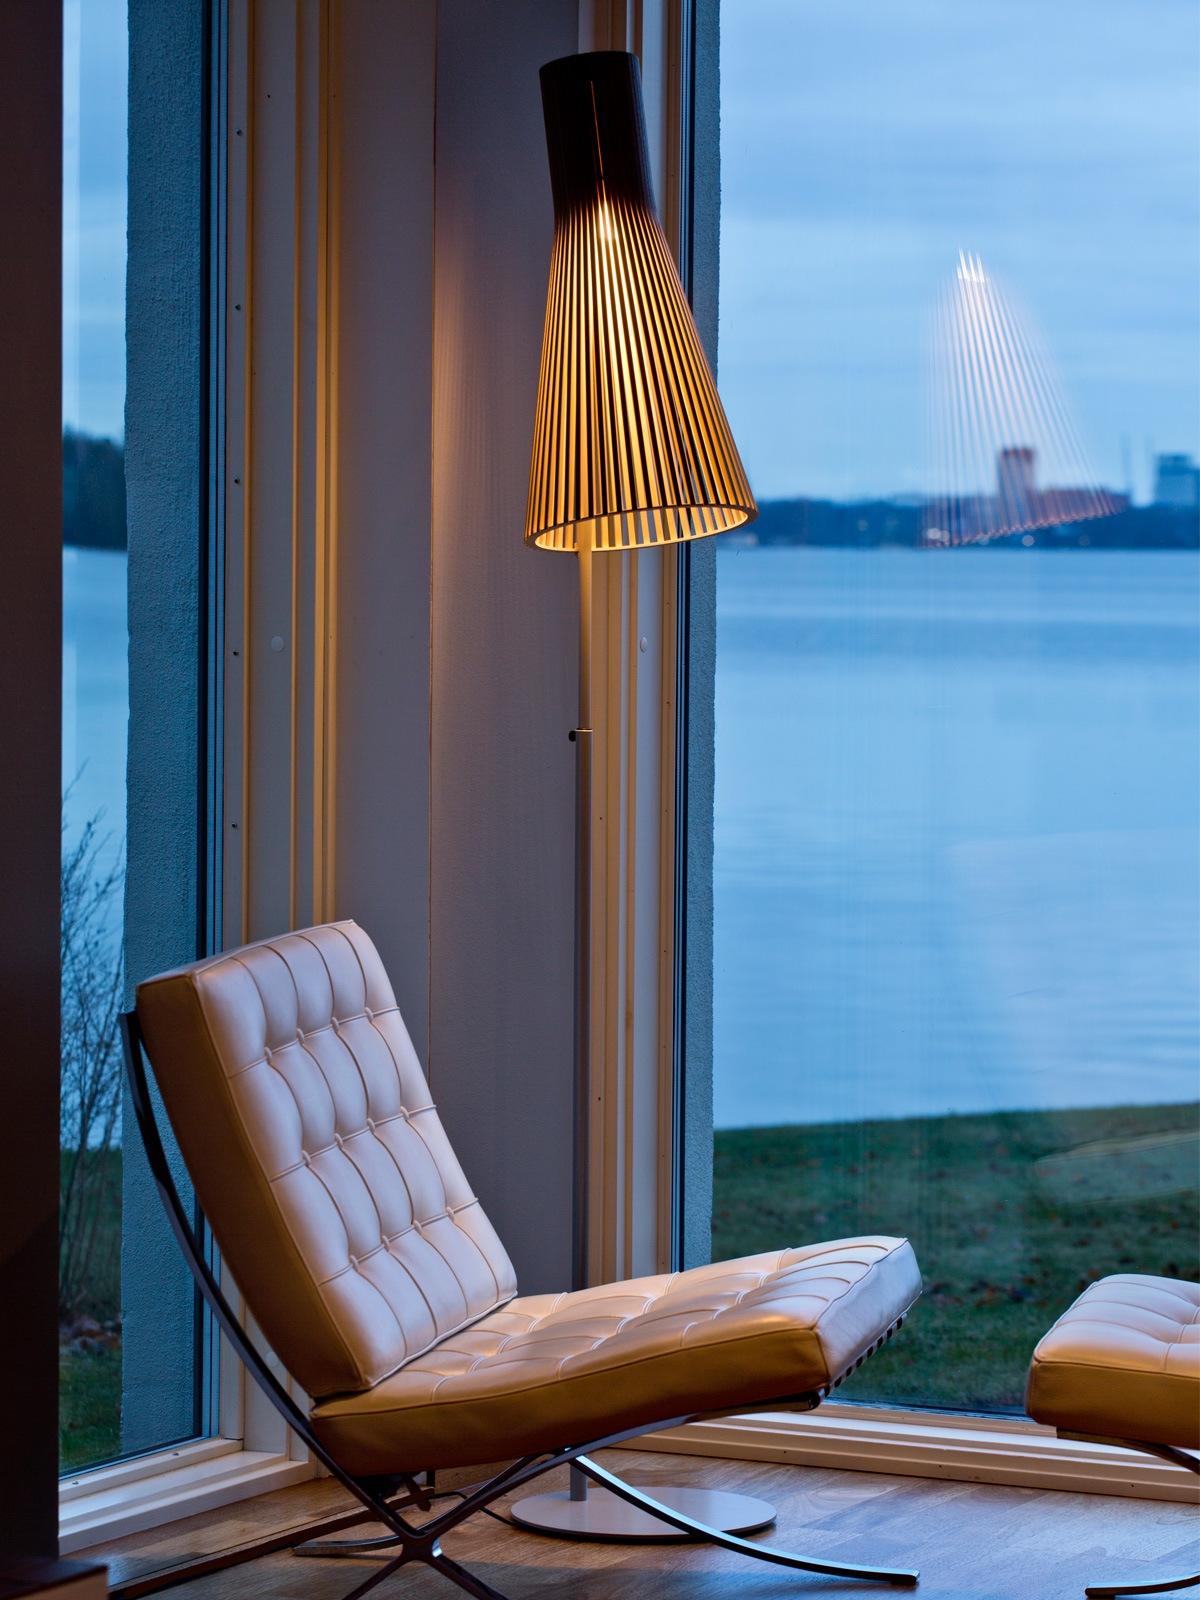 Stehlampe Secto 4210 Secto Design DsignOrt Berlin Lampen Onlineshop